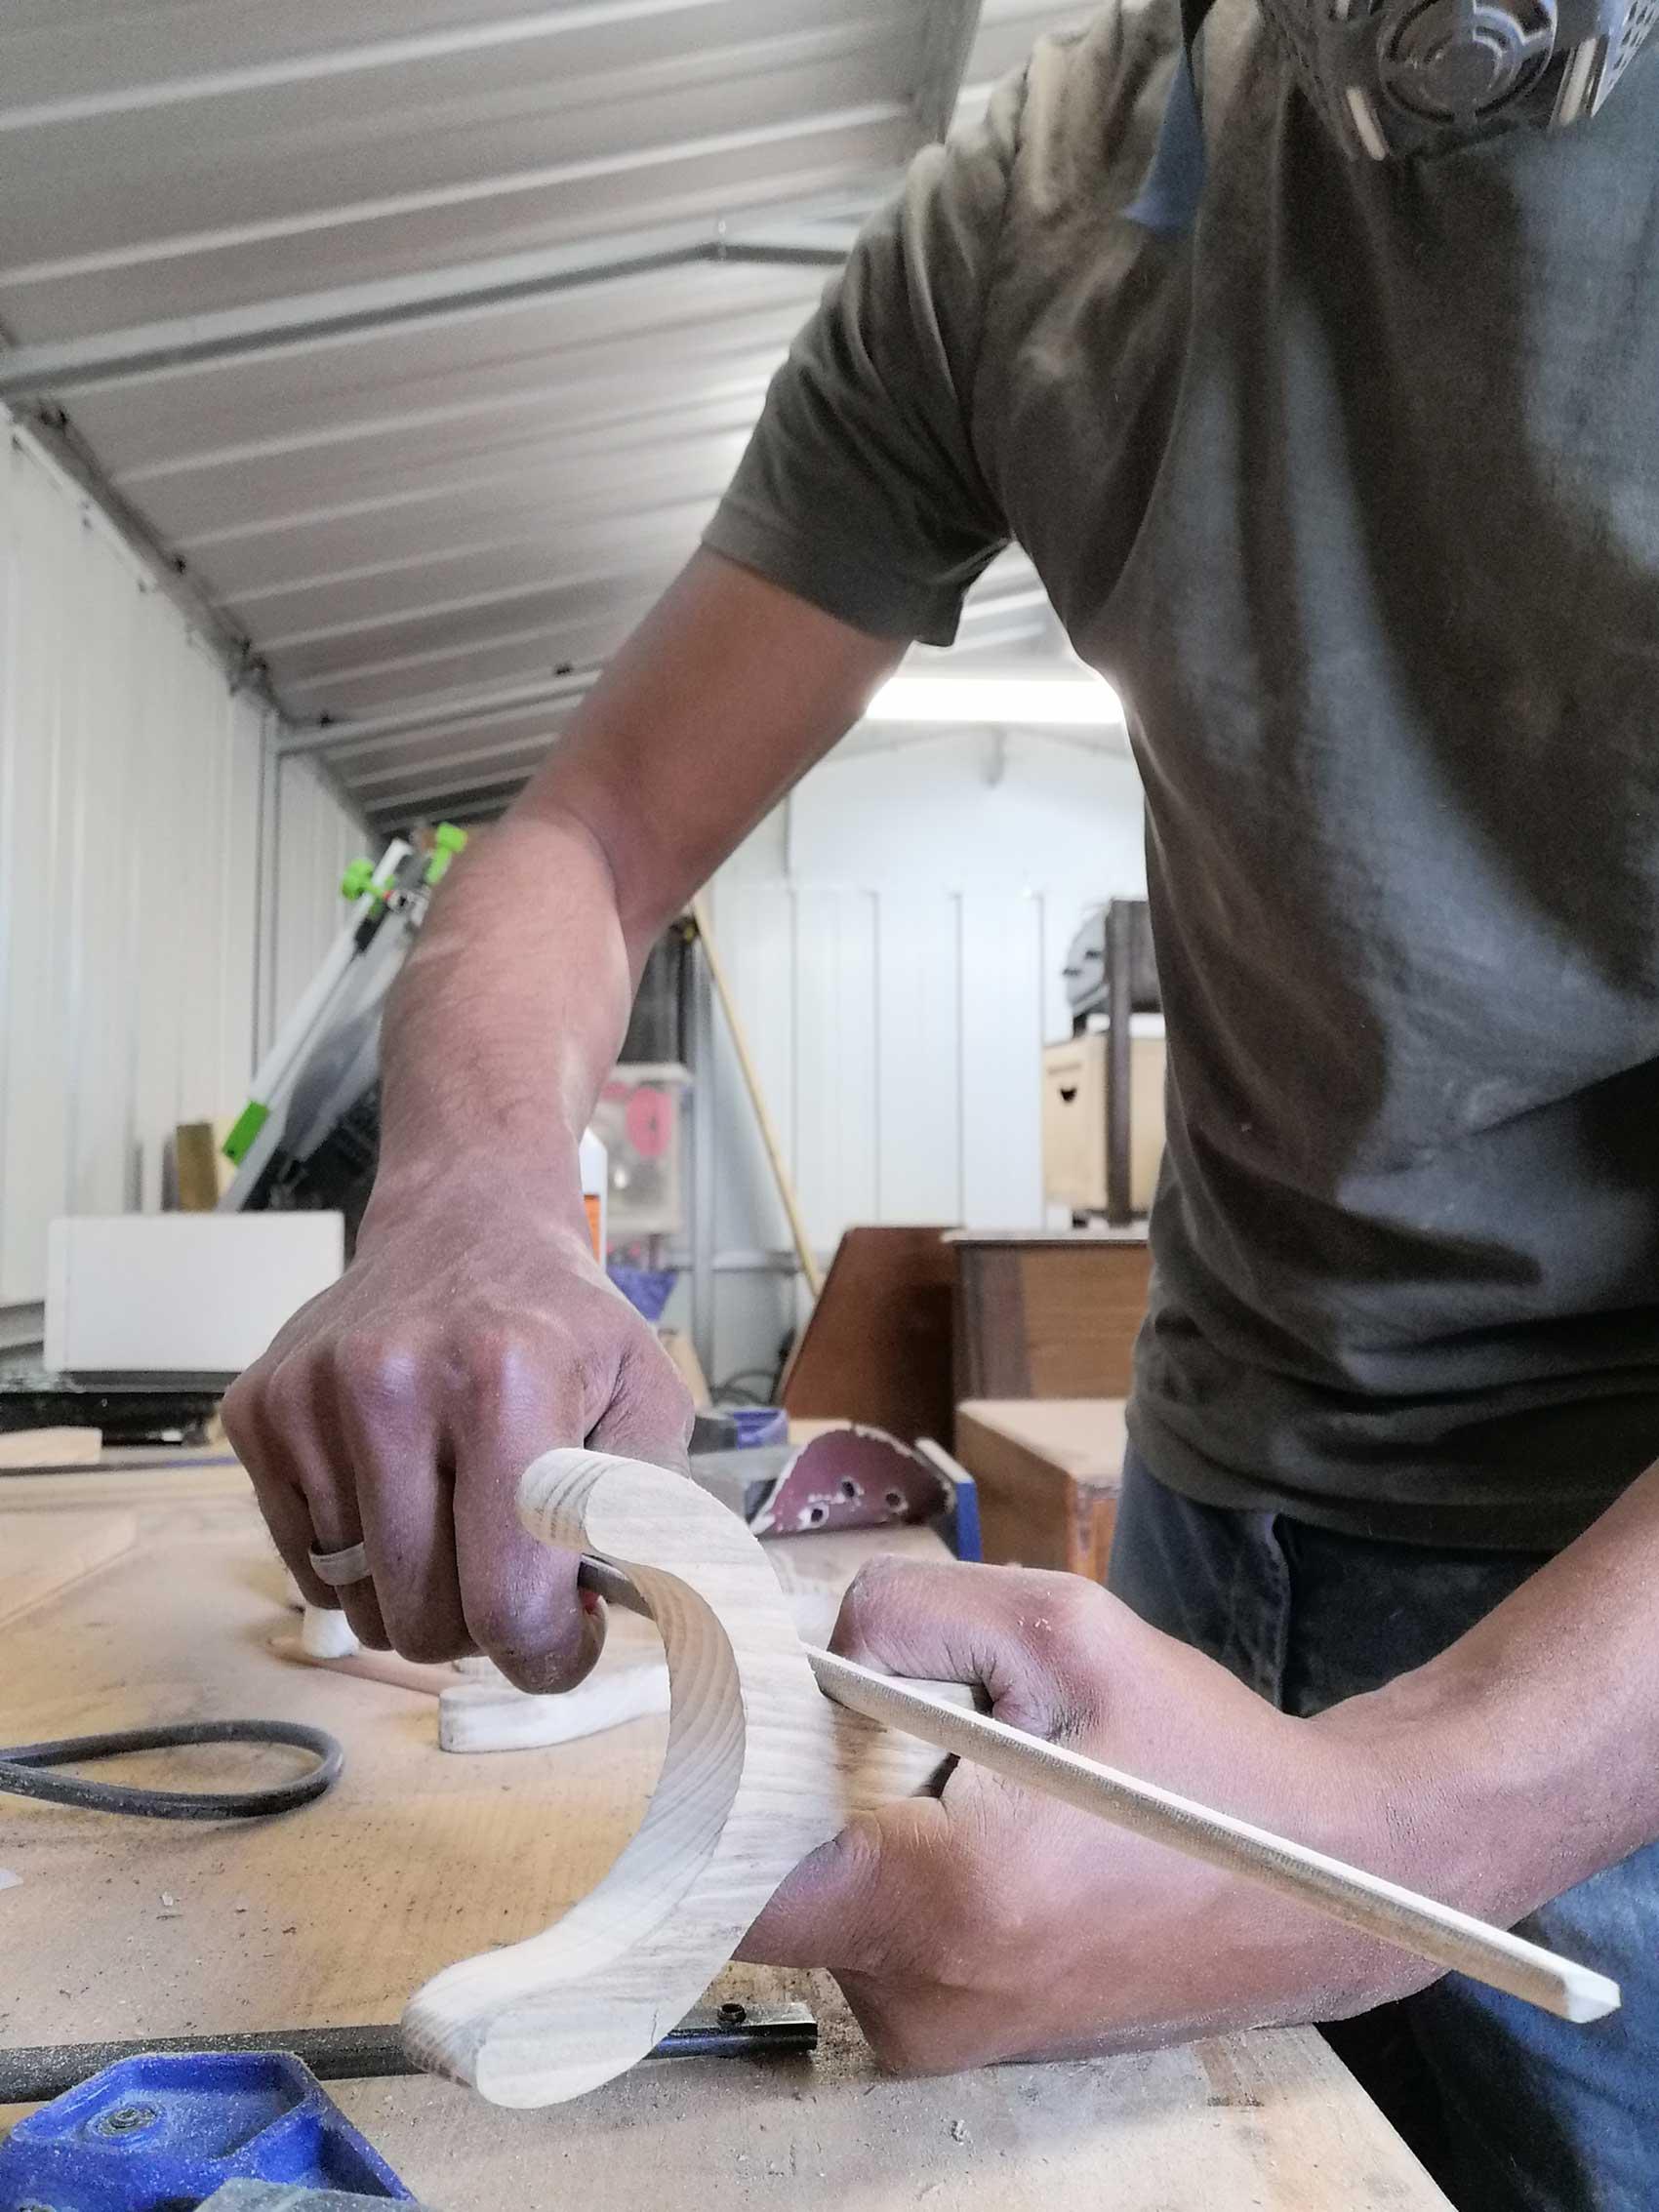 Filing the slingshot